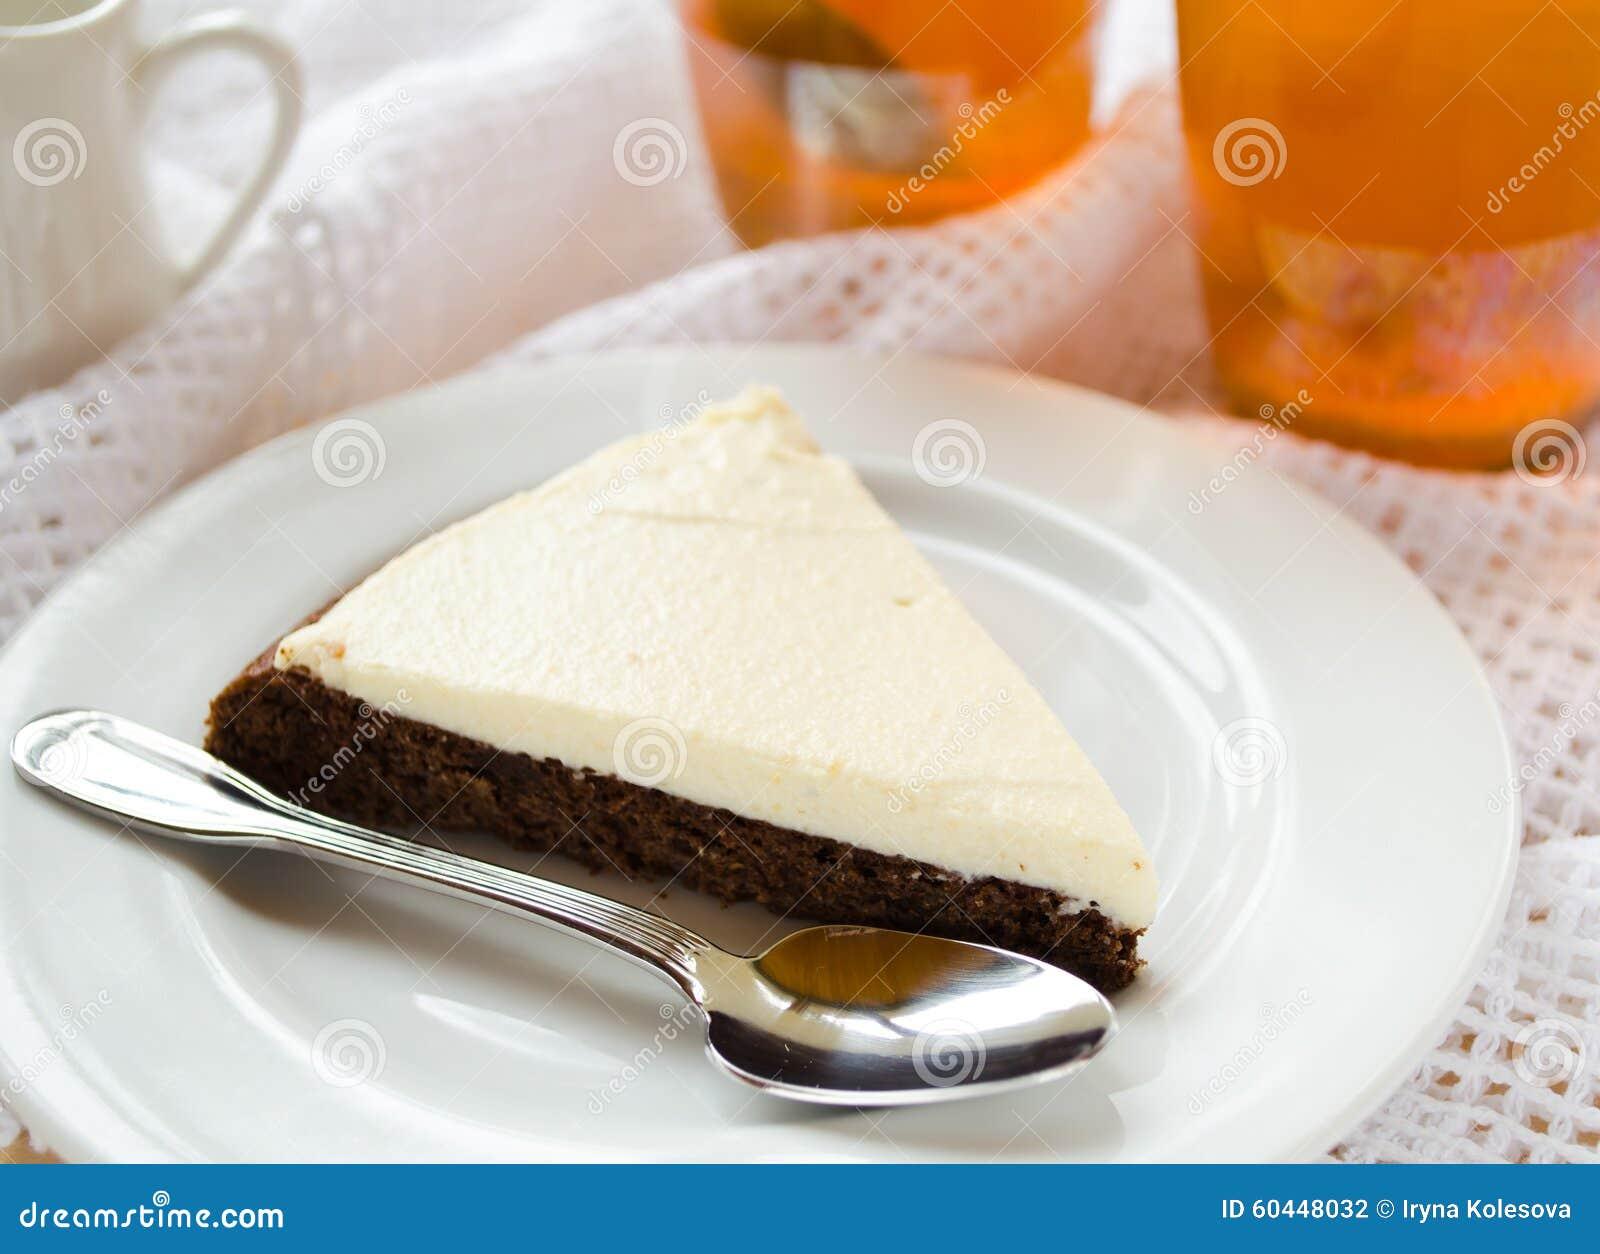 Homemade Chocolate Pie With Cream Cheese Stock Photo - Image: 60448032